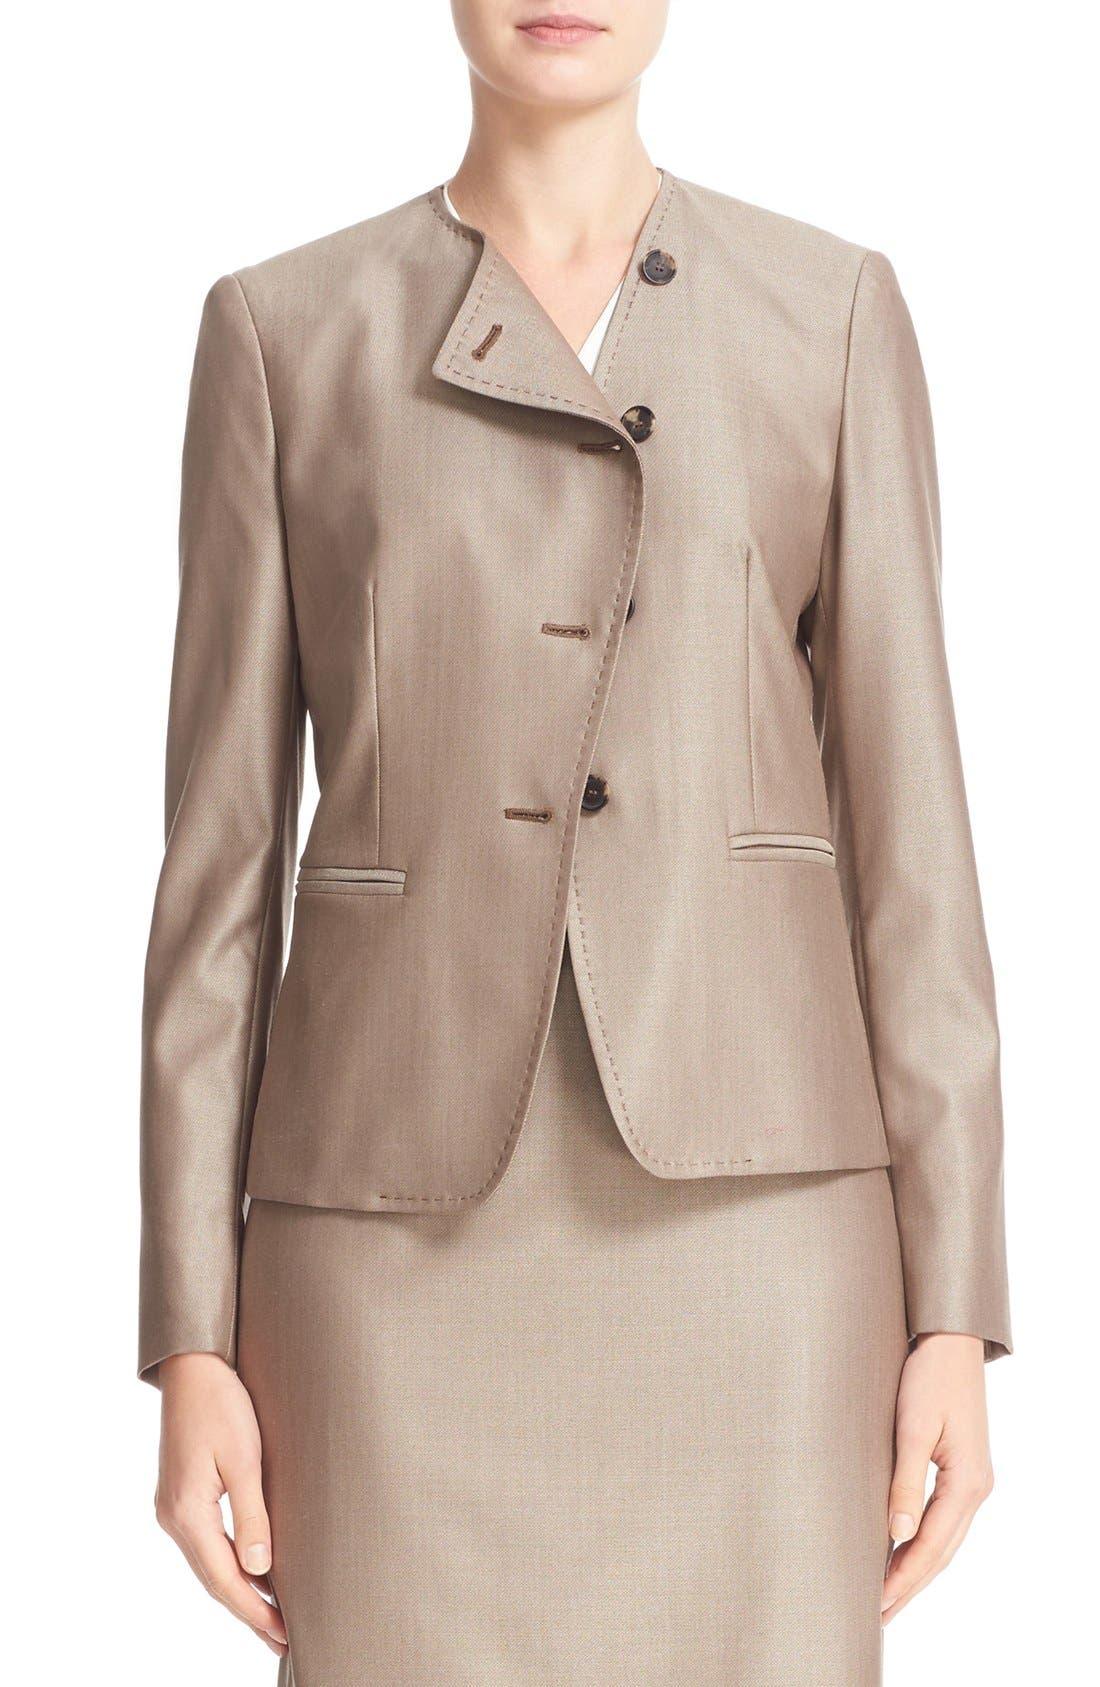 Max Mara Erba Asymmetrical Jacket